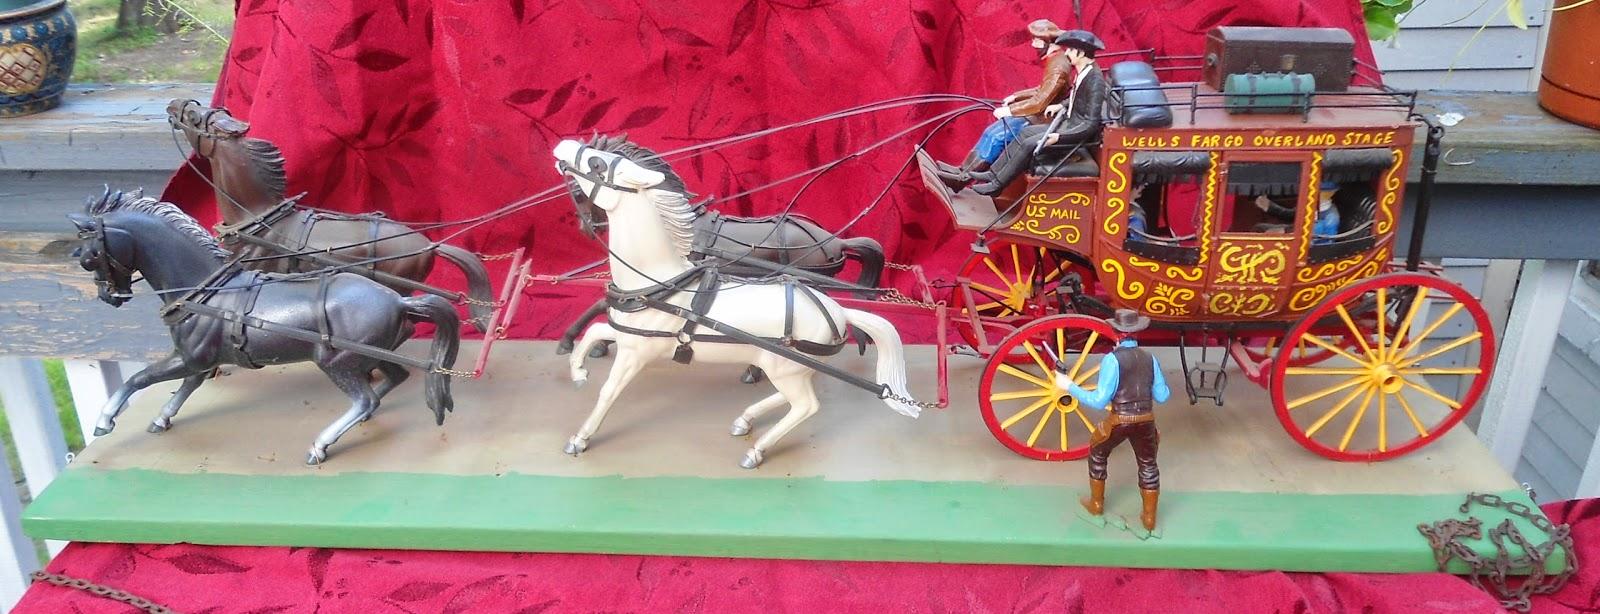 Phoebes Hidden Treasures Antiques And Collectibles Blog Man Cave Wells Fargo